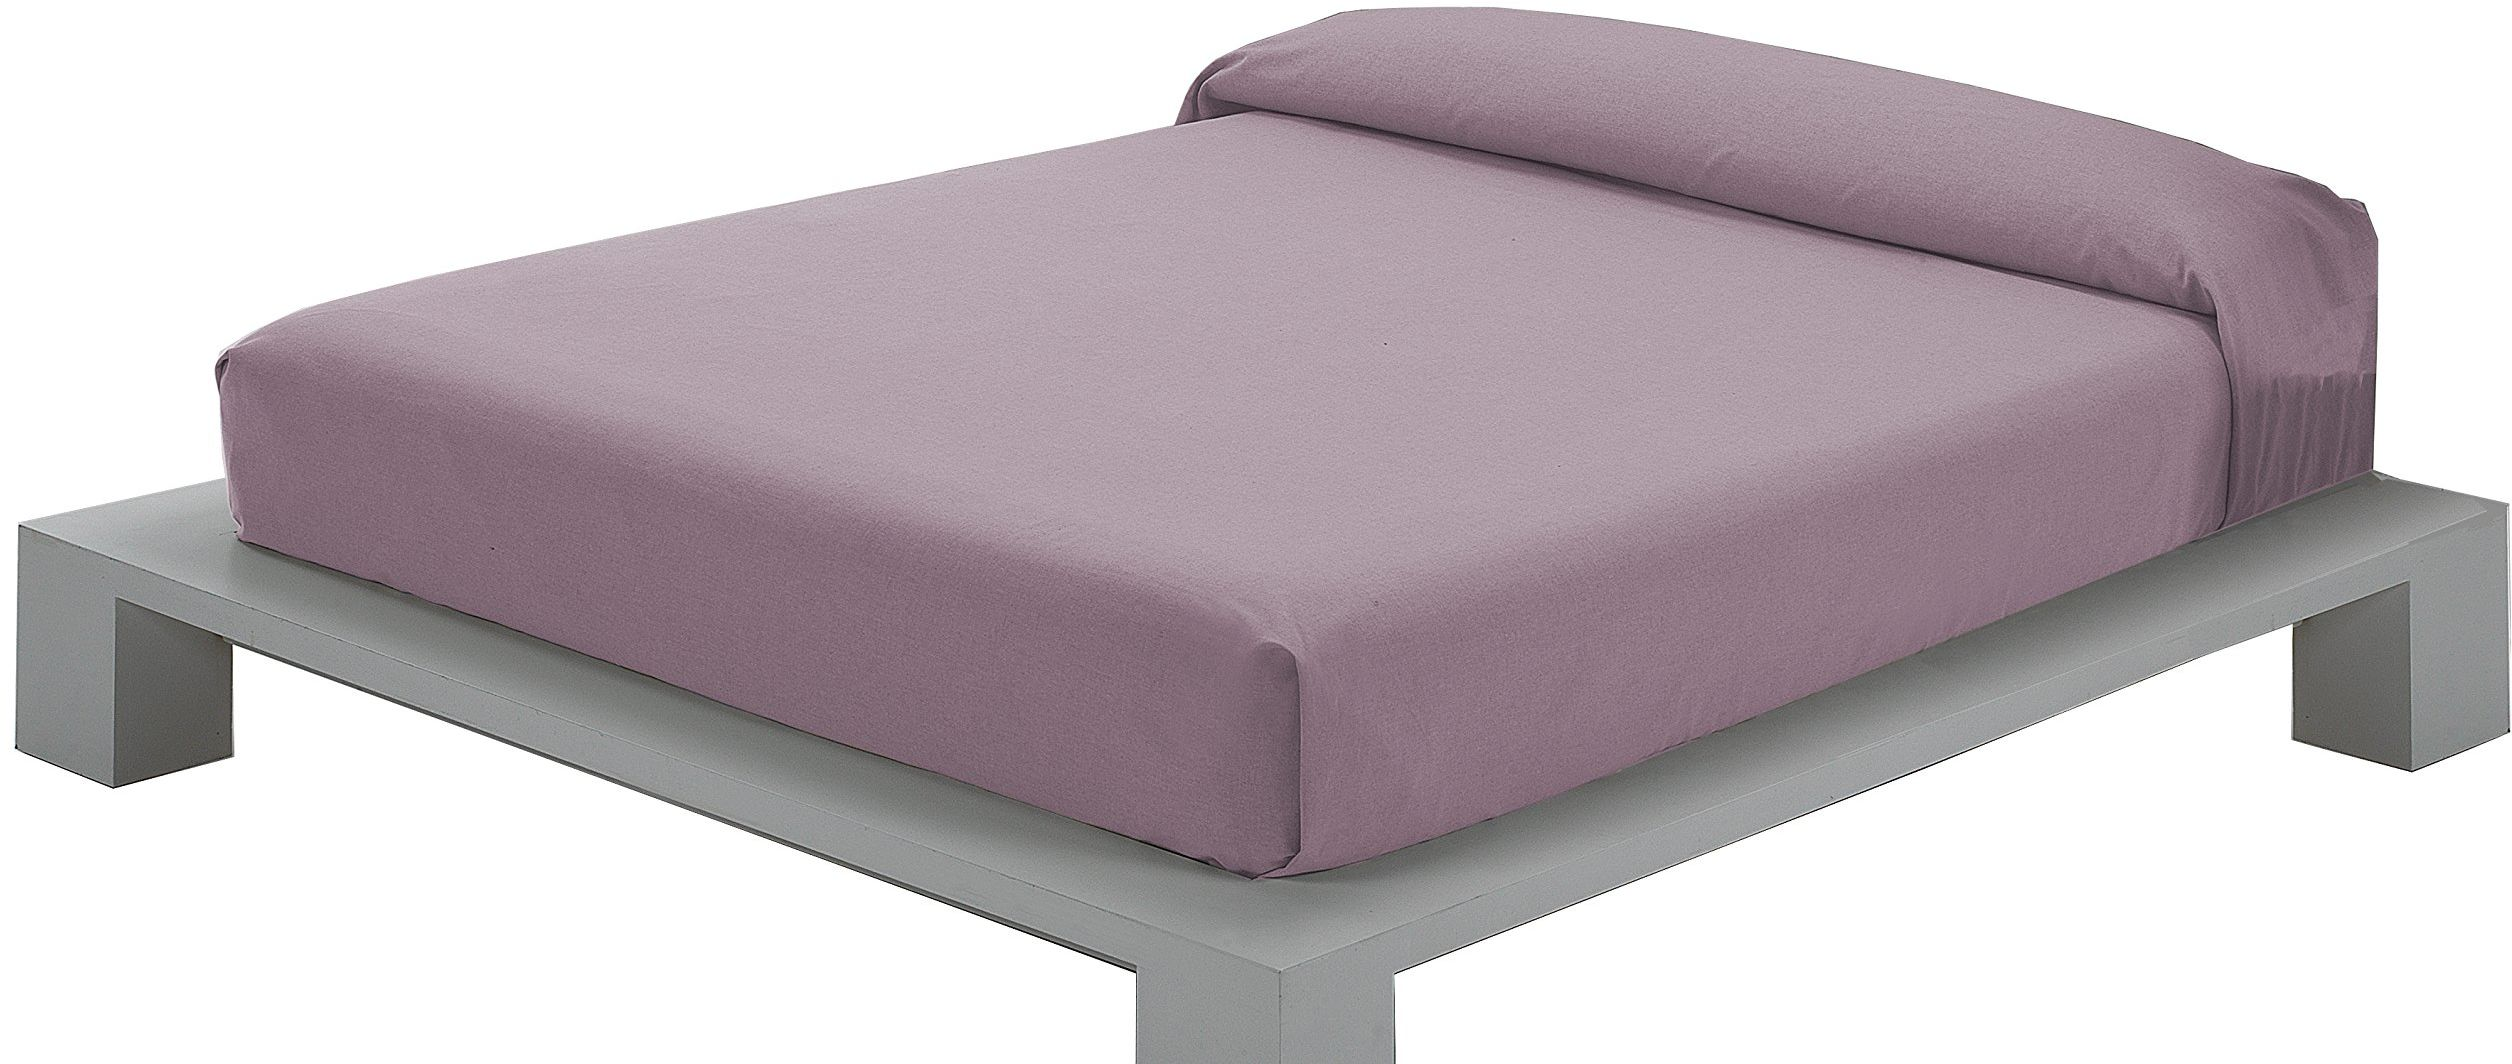 Martina Home Culla chusta wielofunkcyjna 130 x 180 cm kolor 21 - fioletowy